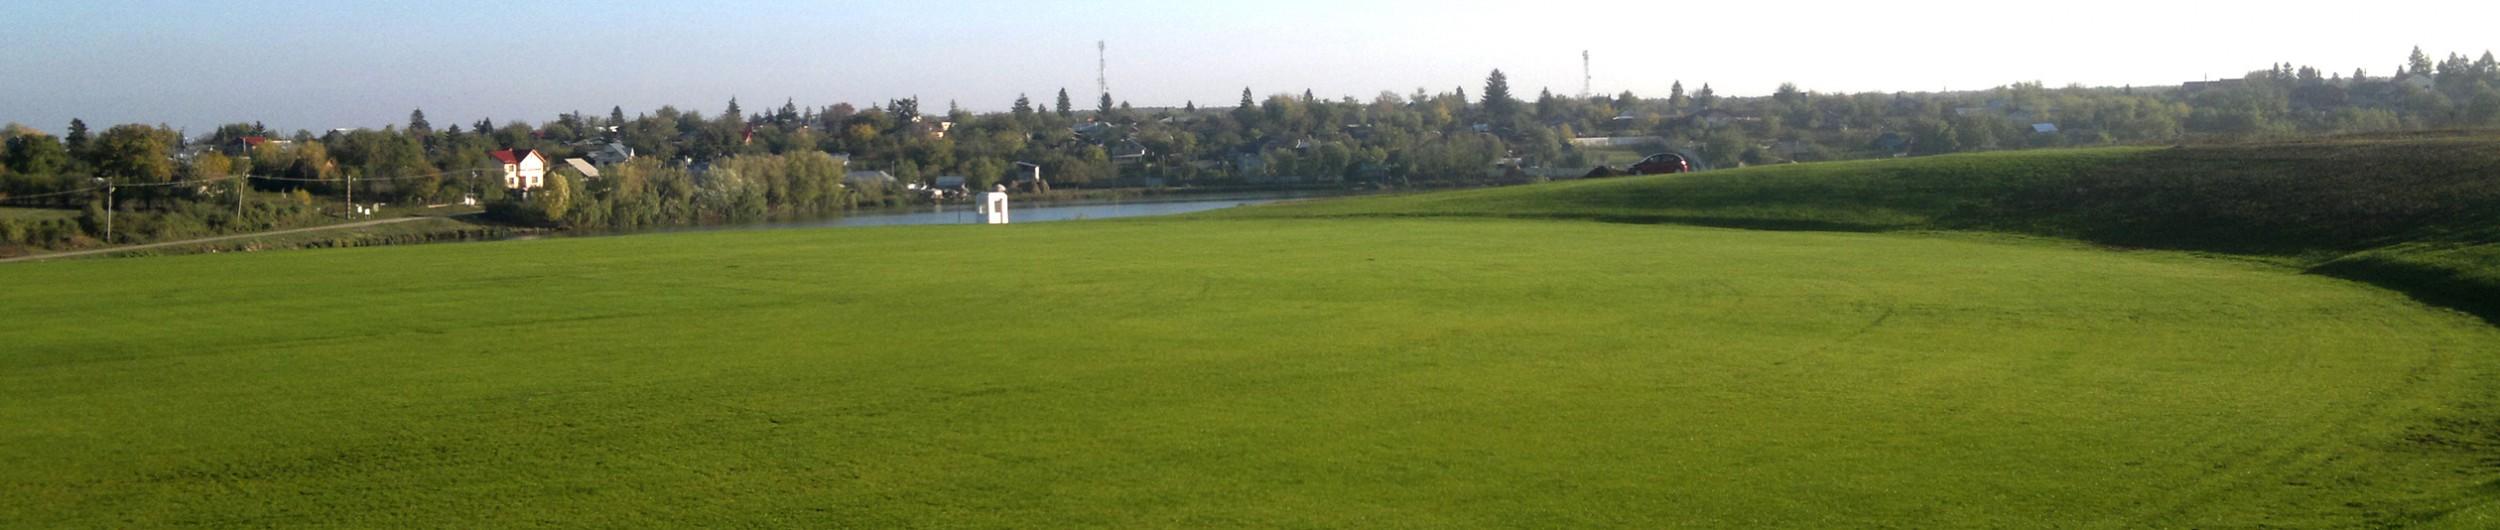 An Open Grassy Field